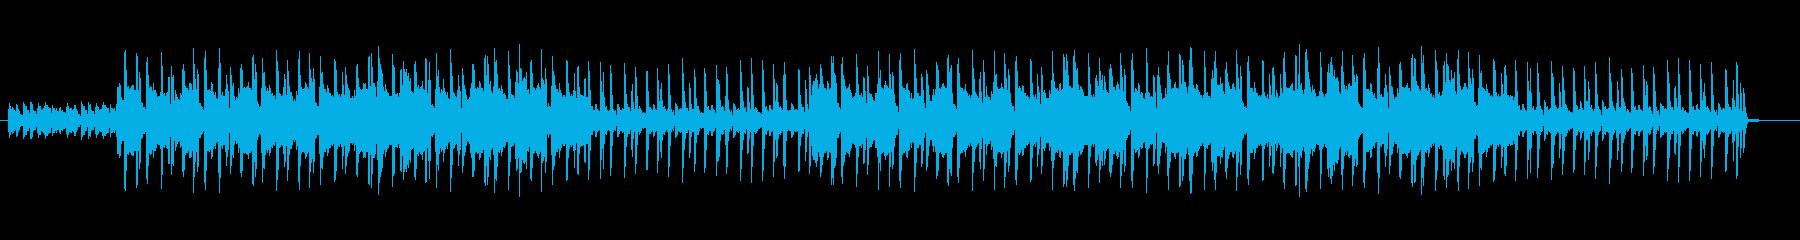 Lofi hip hop 不安定な感じの再生済みの波形